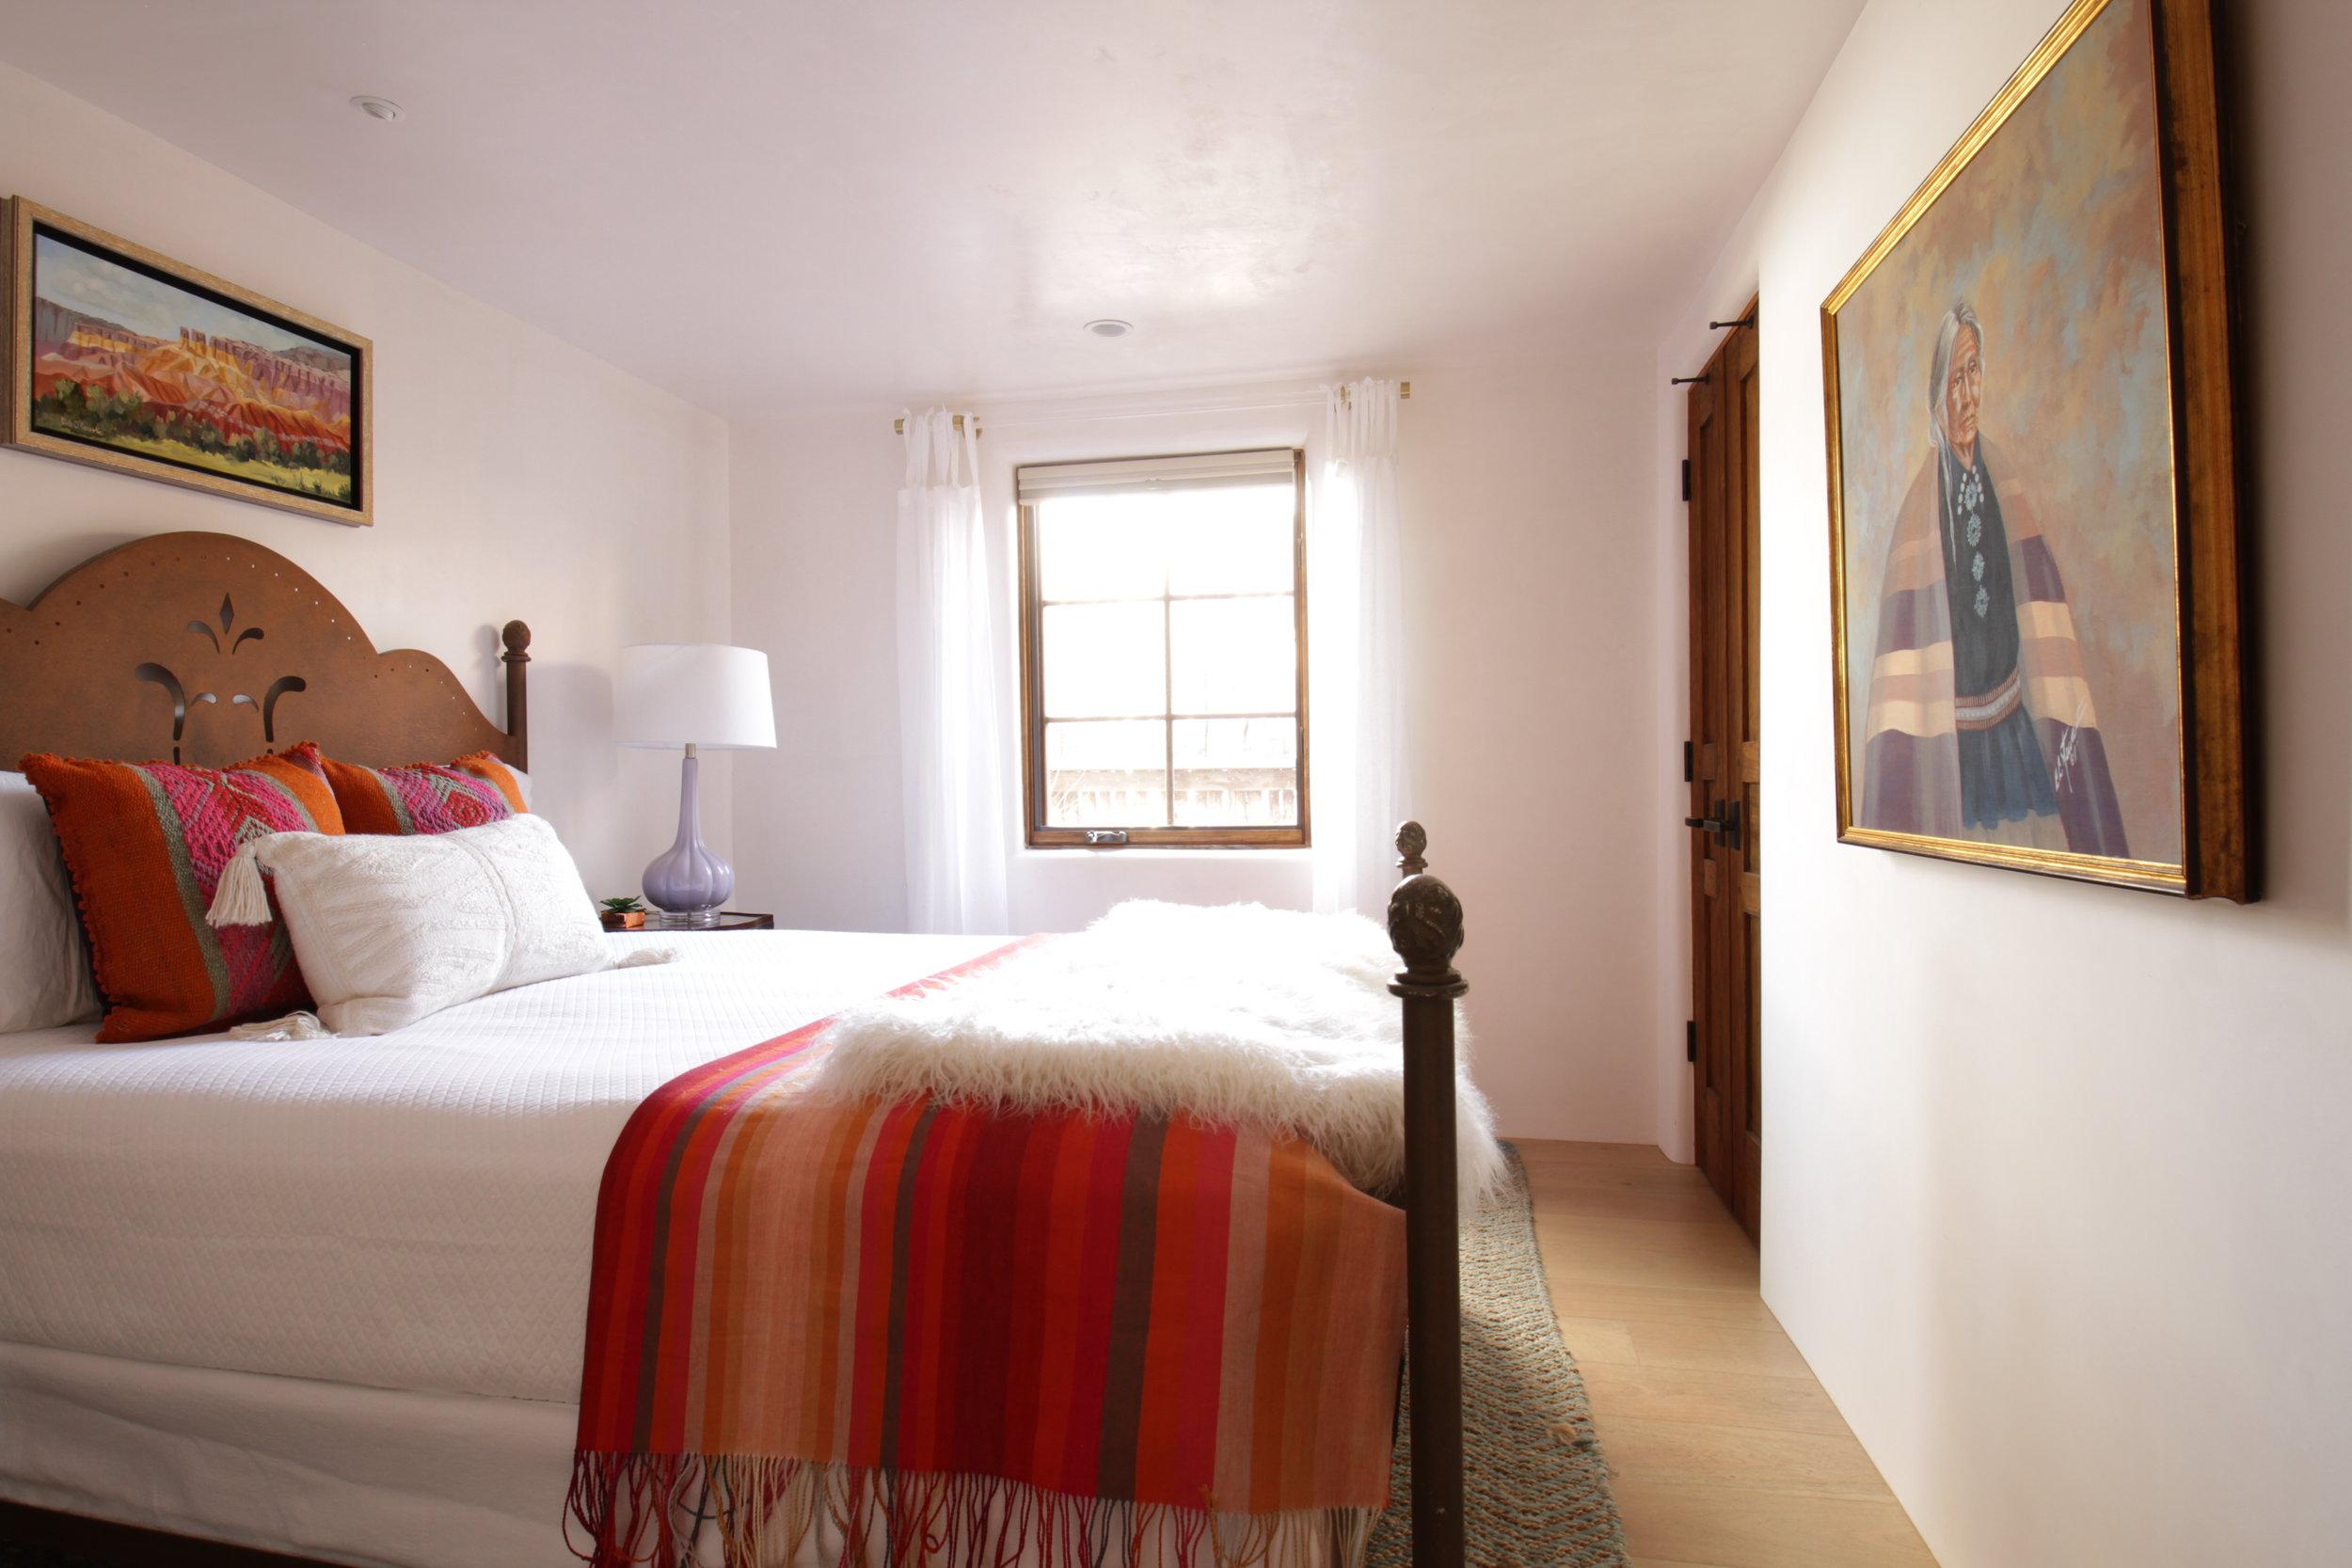 Bedroom Interior Design and Art.JPG